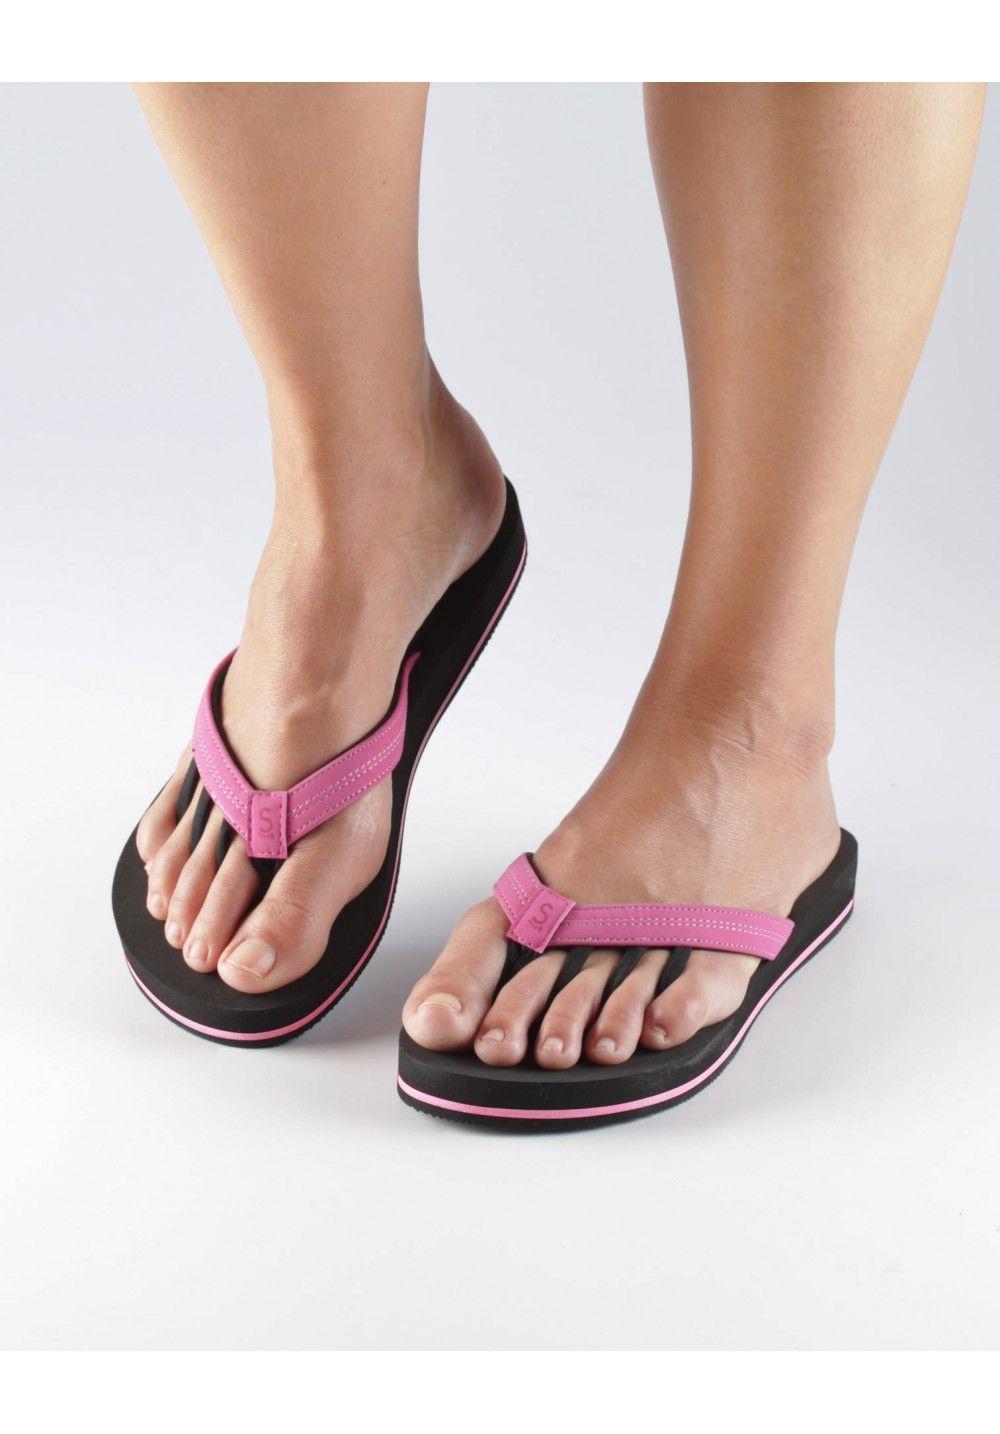 Five Toe Sandals Reina  I Wish  Sandals, Flip Flop Sandals, Flip Flops-8238